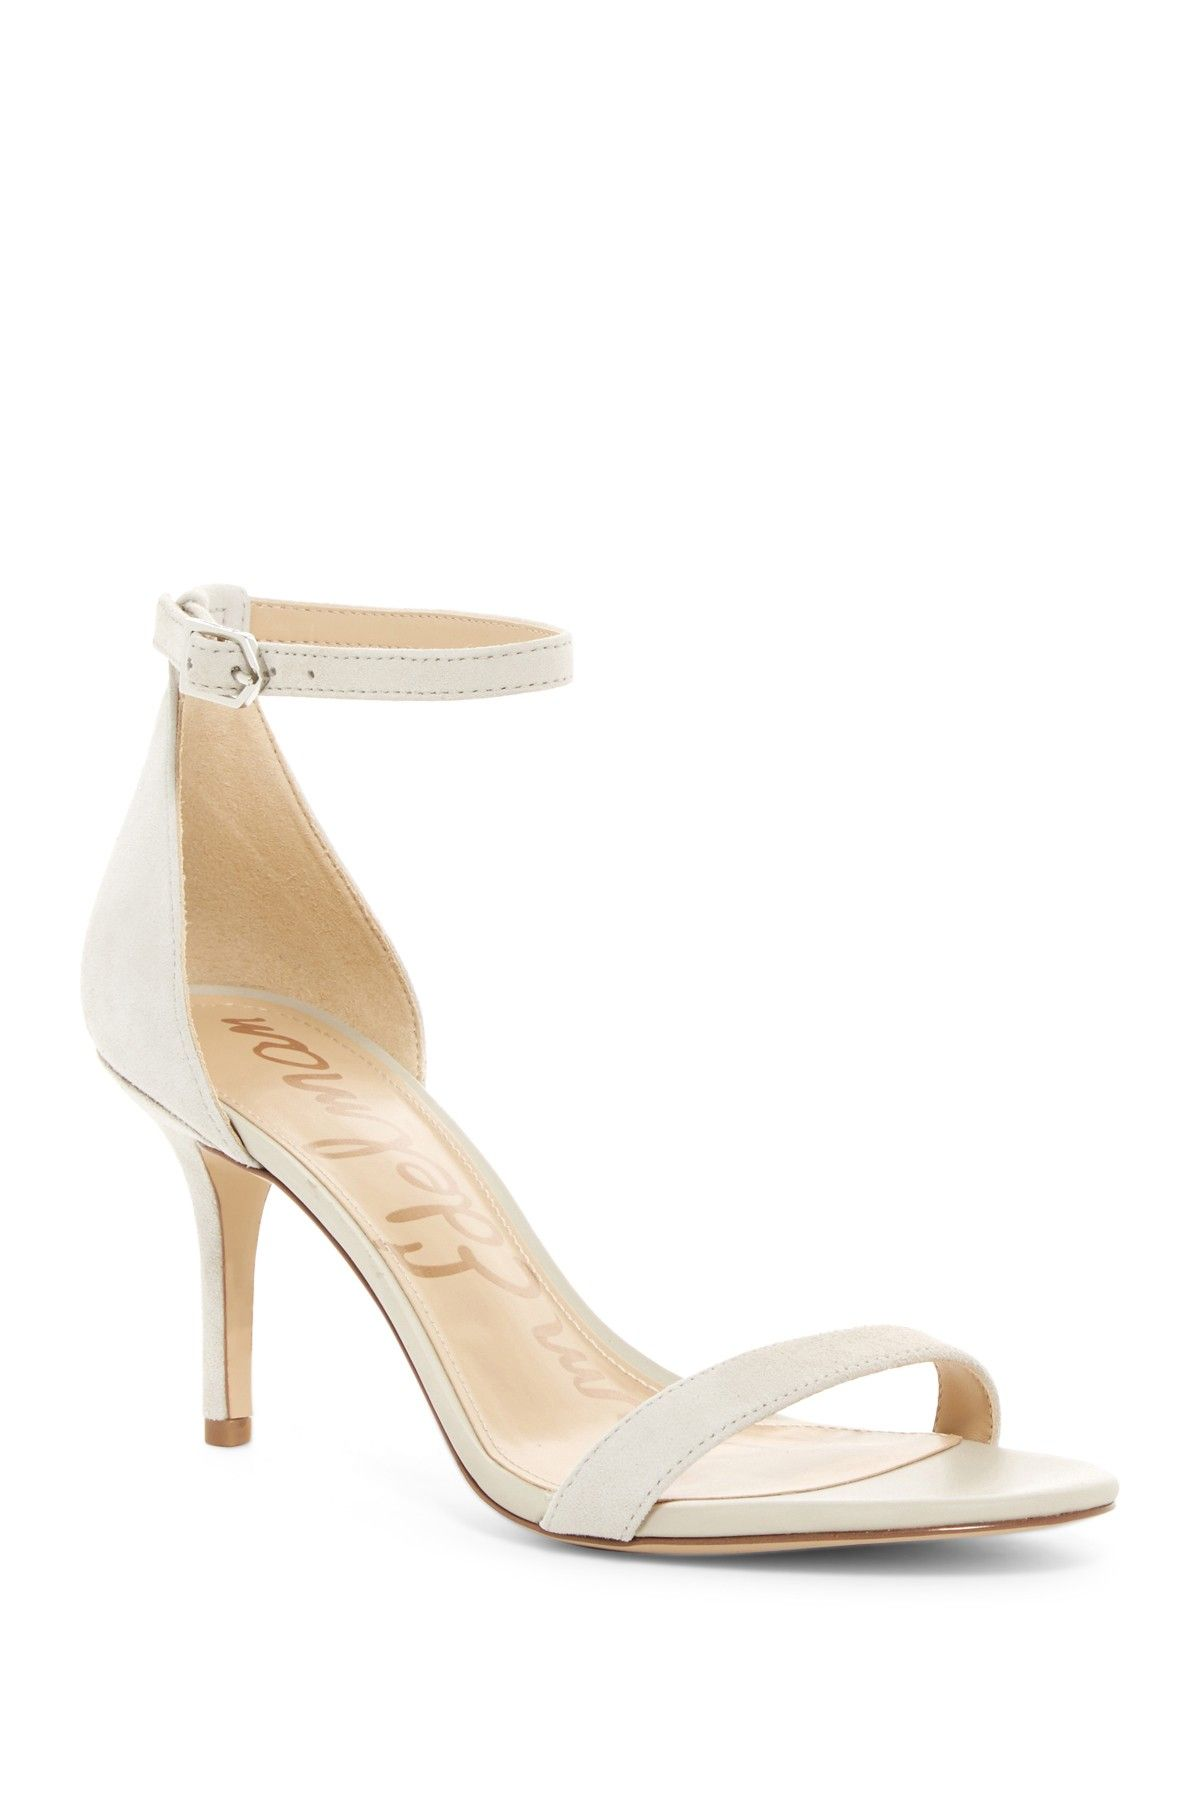 Patti Ankle Strap Sandal   Ankle strap sandals, Sandals